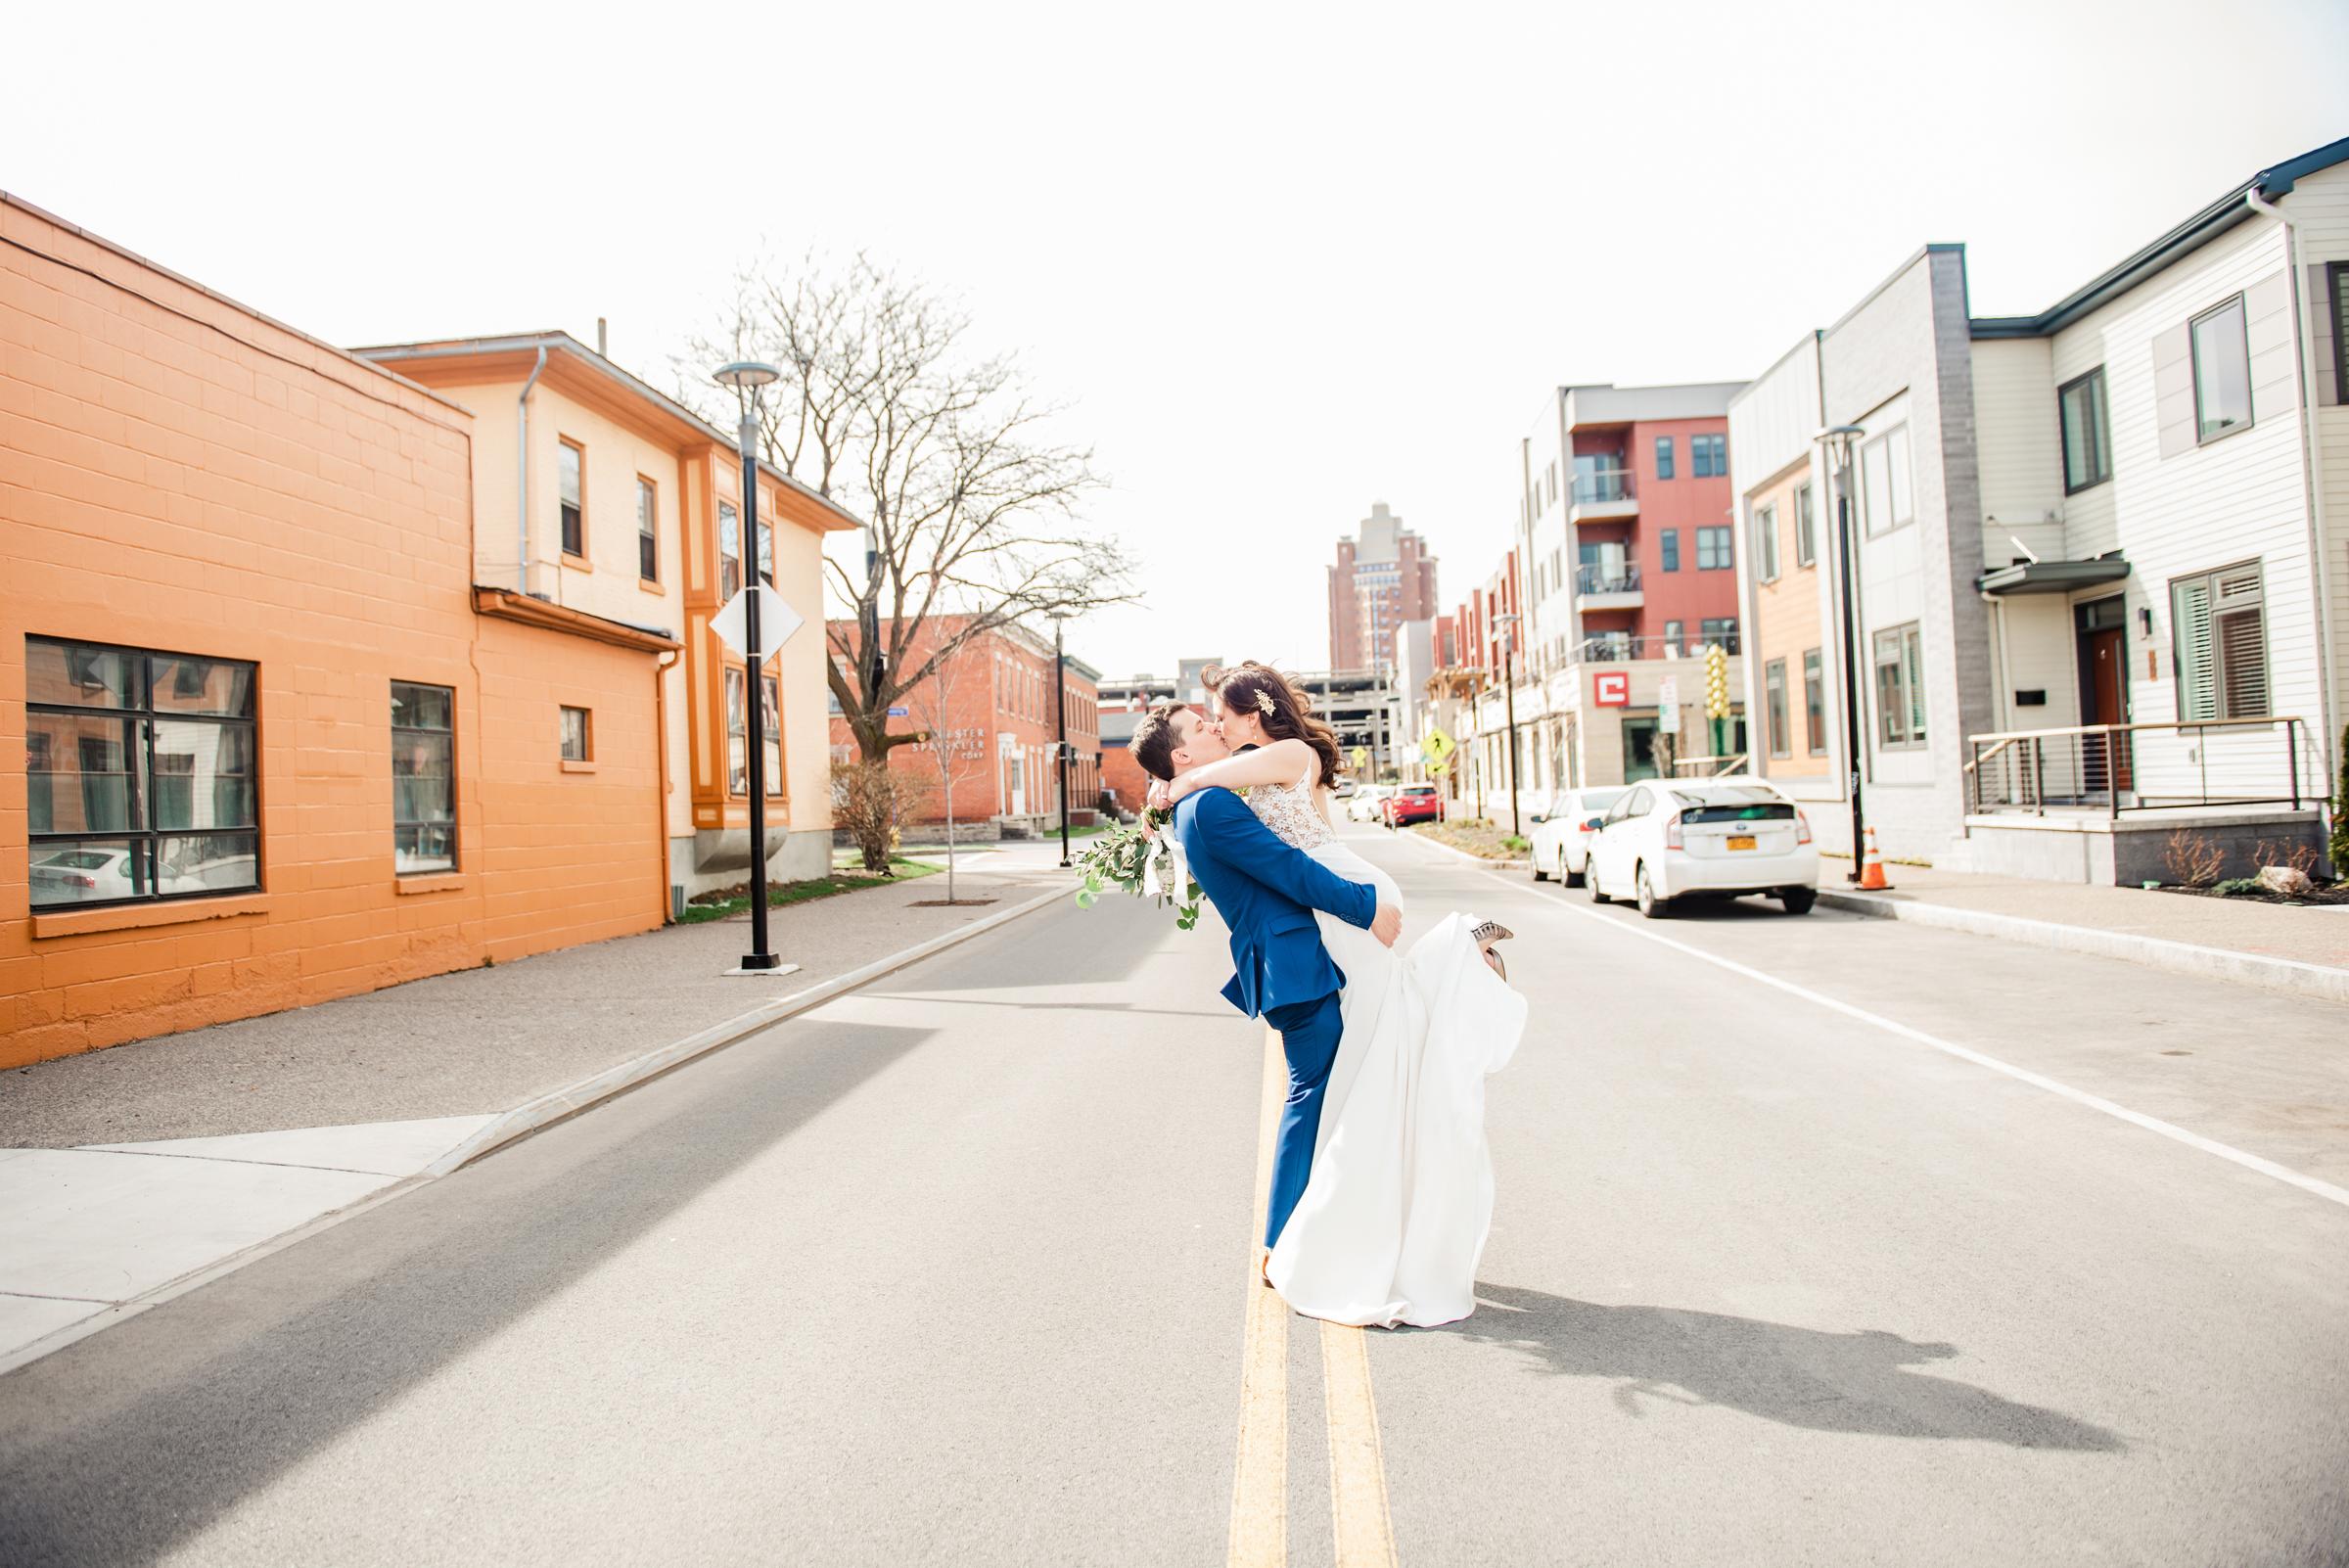 The_Arbor_LoftRochester_Wedding_JILL_STUDIO_Rochester_NY_Photographer_160211.jpg